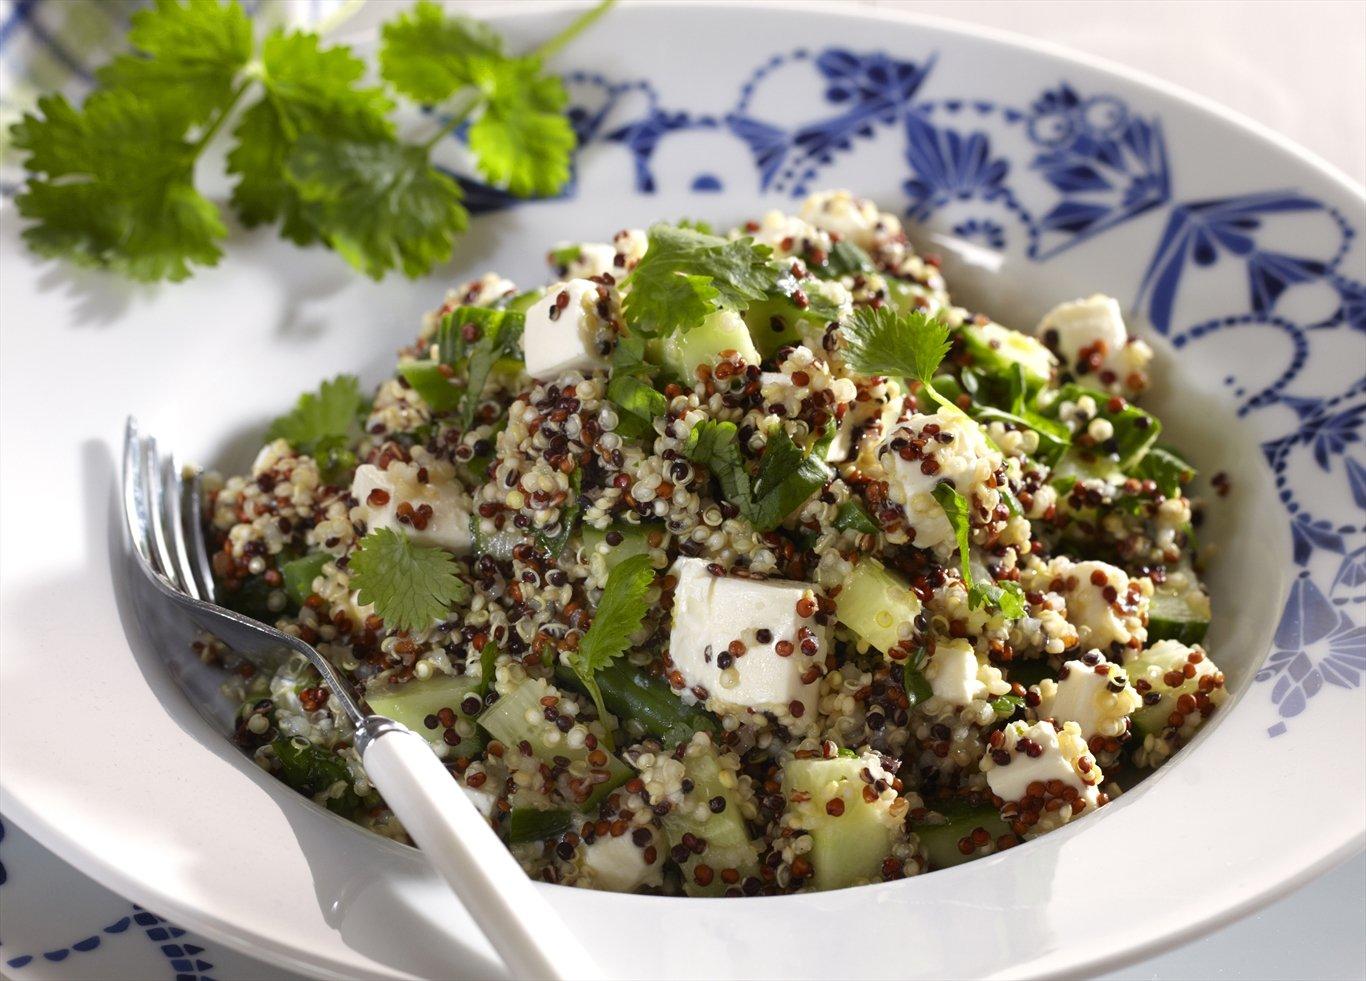 Quinoasalat mit Feta Käse schmackhaft gesund